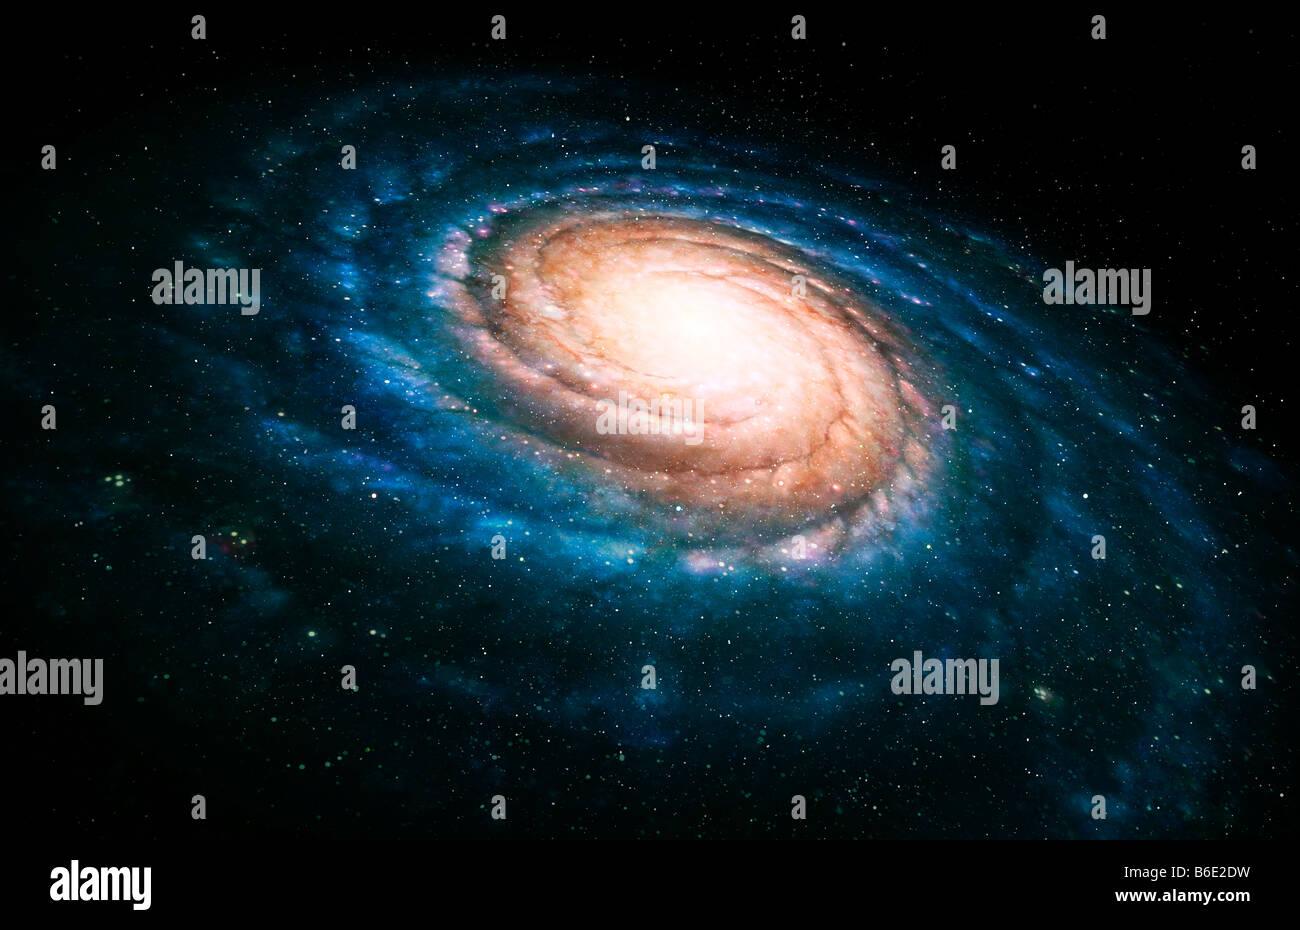 Spiral galaxy. Artwork of a spiral galaxy seen atan oblique angle. The spiral arms (blue) containhot, young stars. Stock Photo